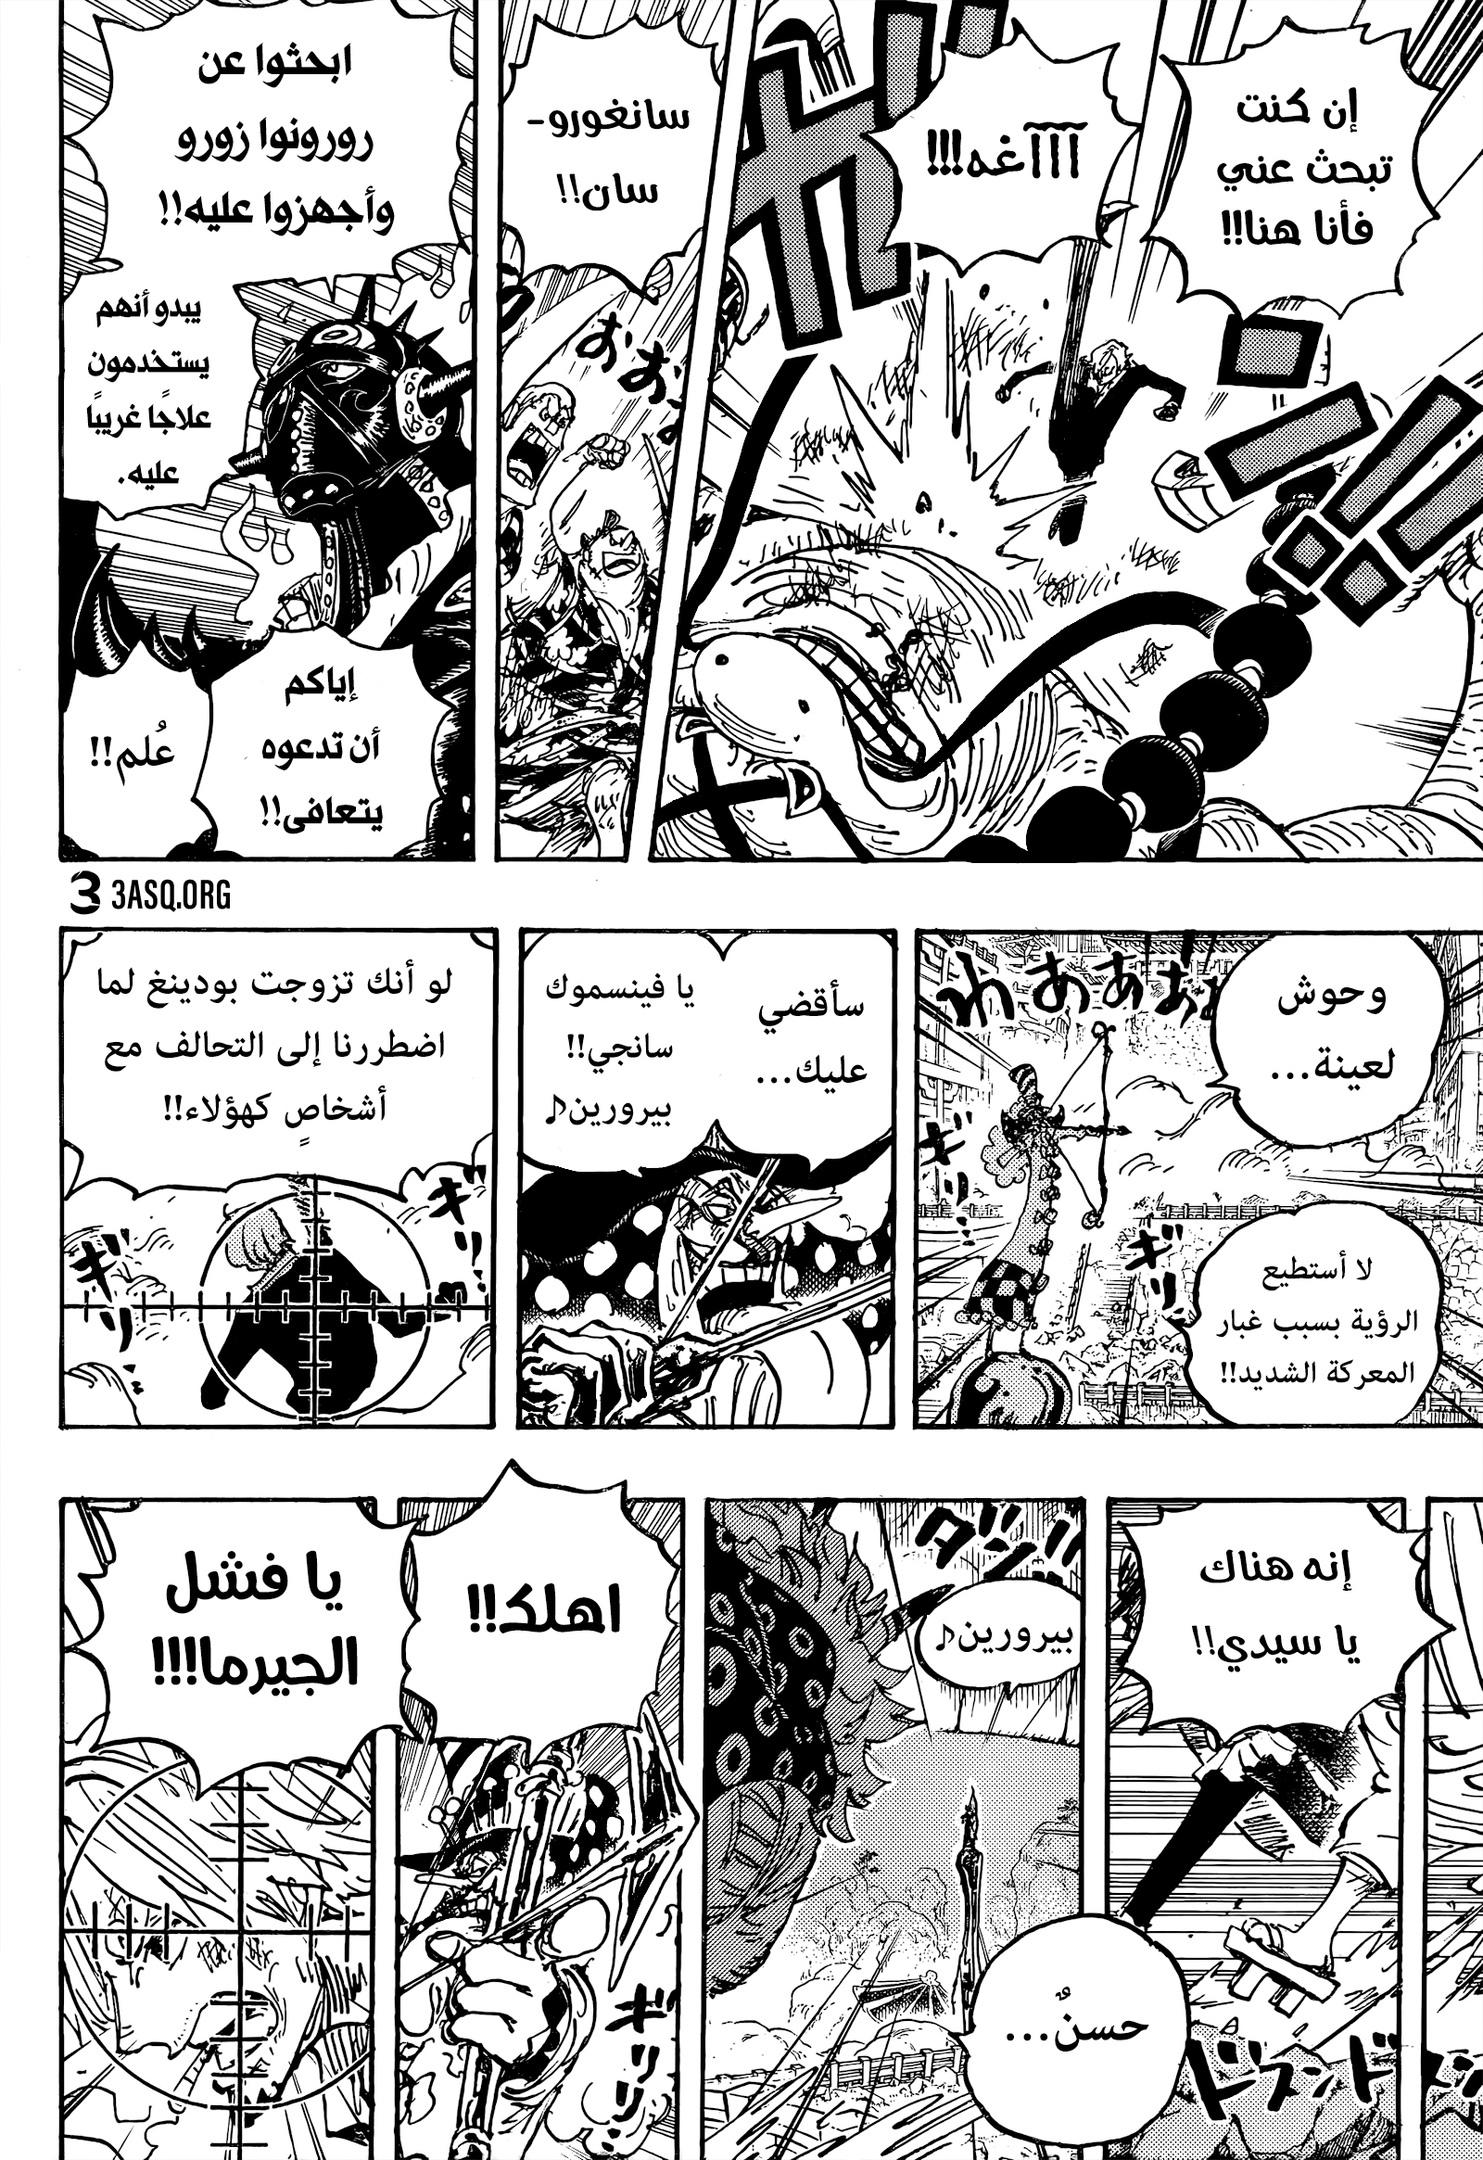 One Piece Arab 1022, image №12